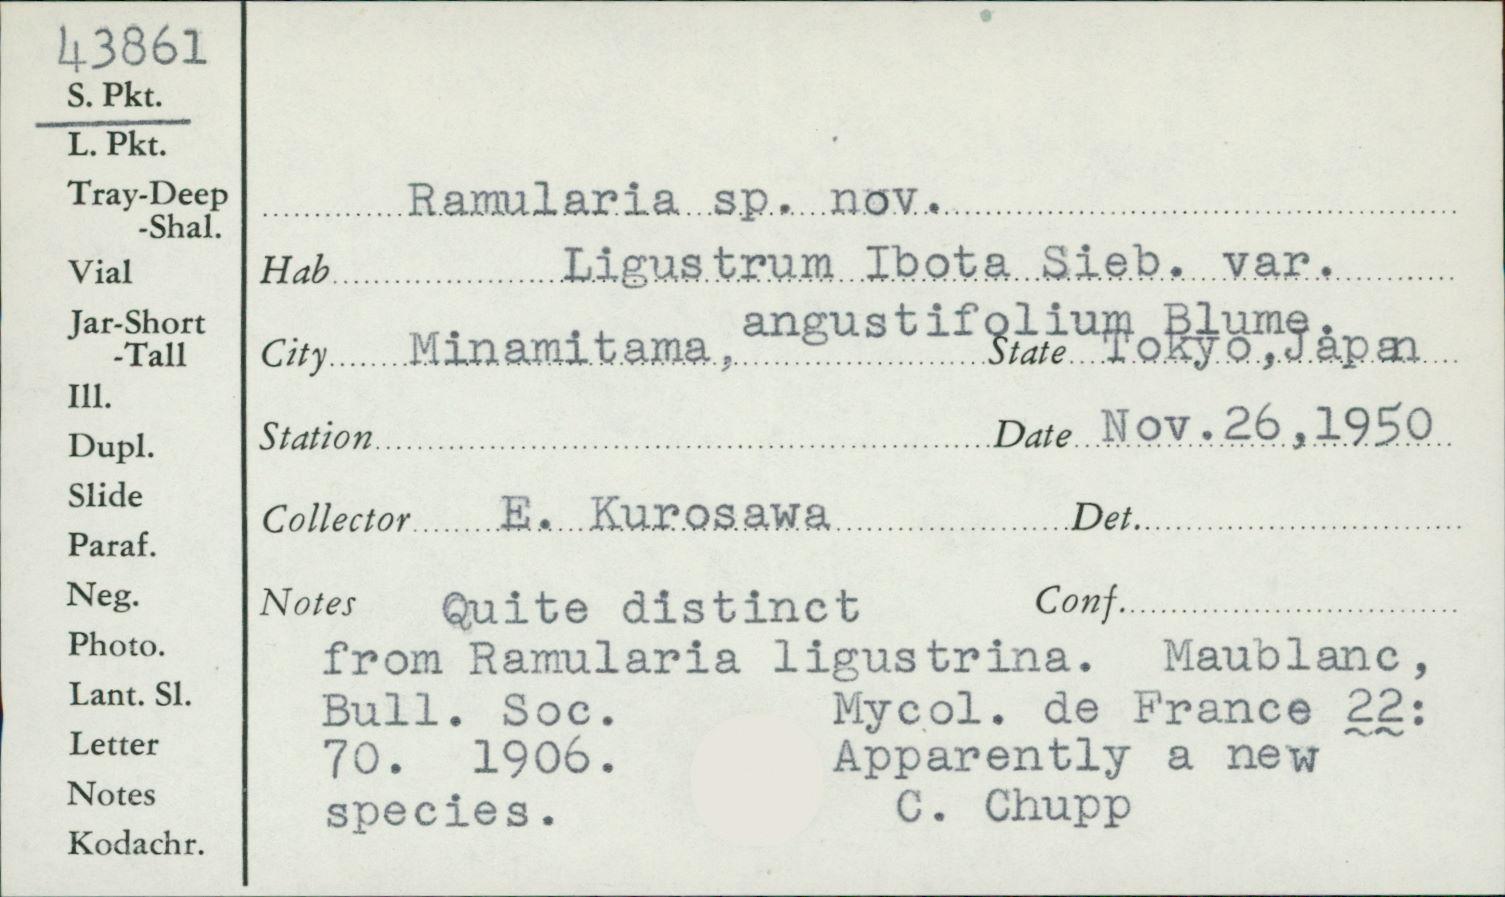 Ramularia ligustrina image